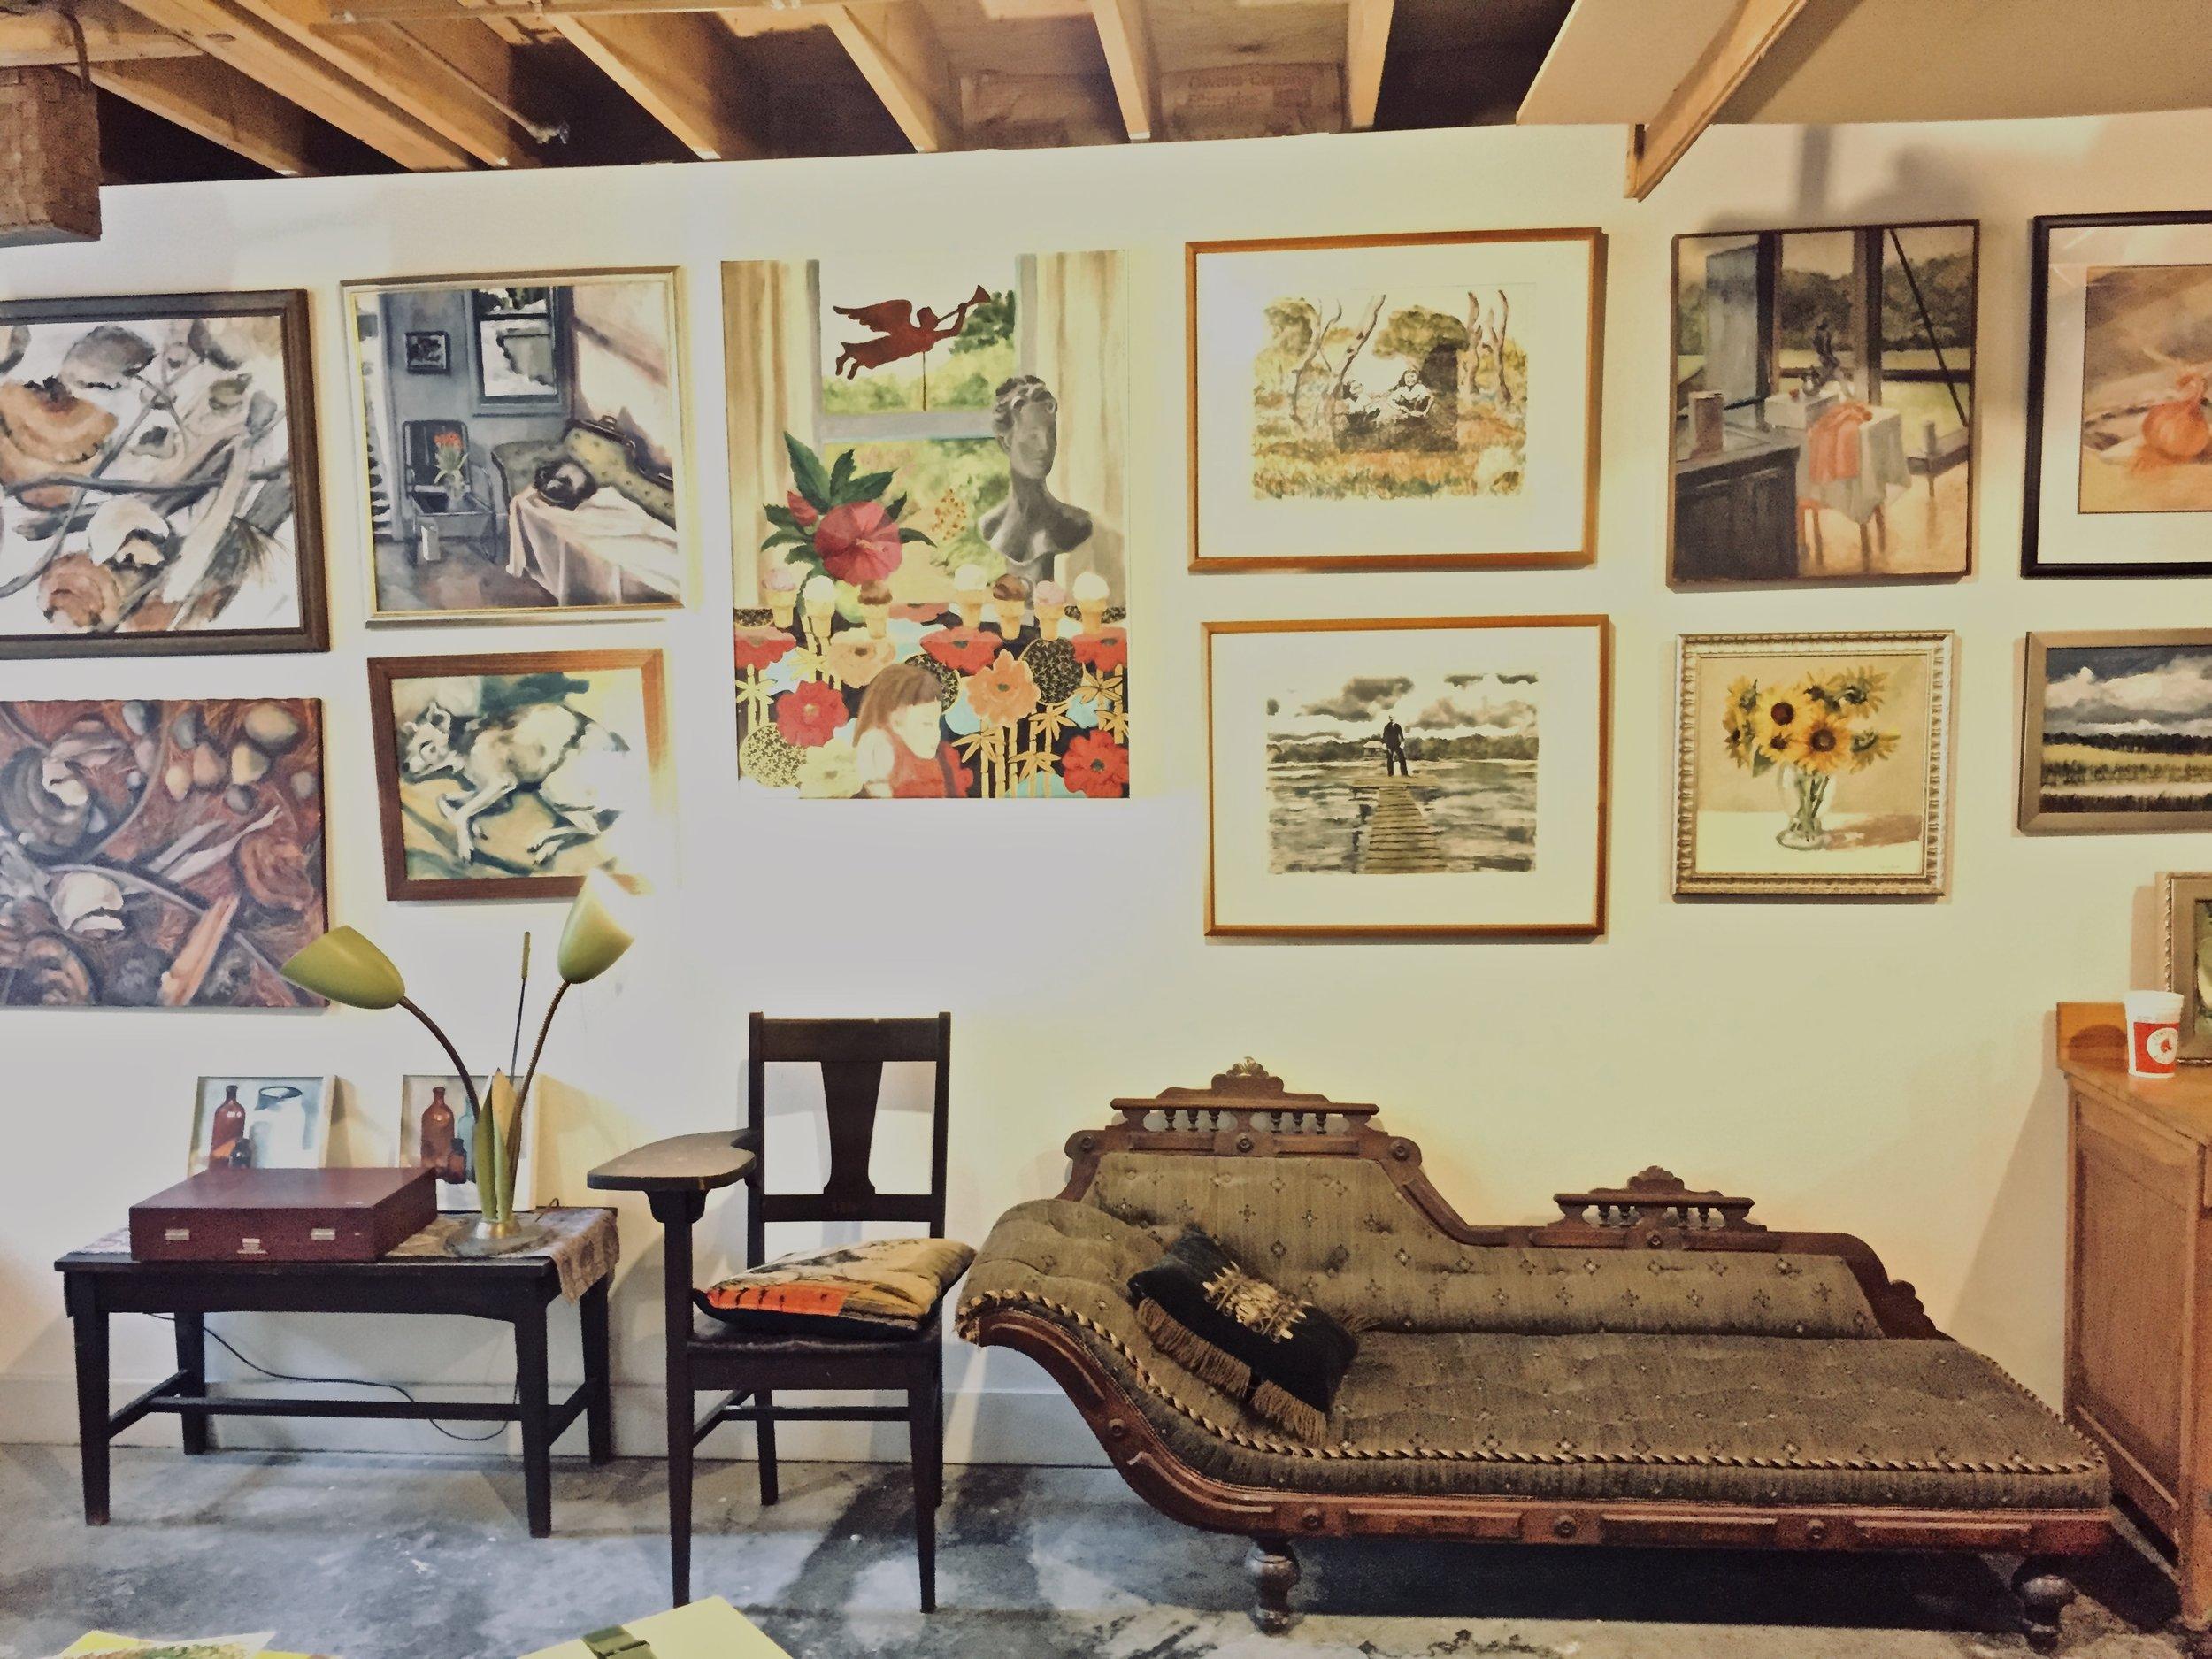 A garden basement painting studio Photo by Barbra Revill